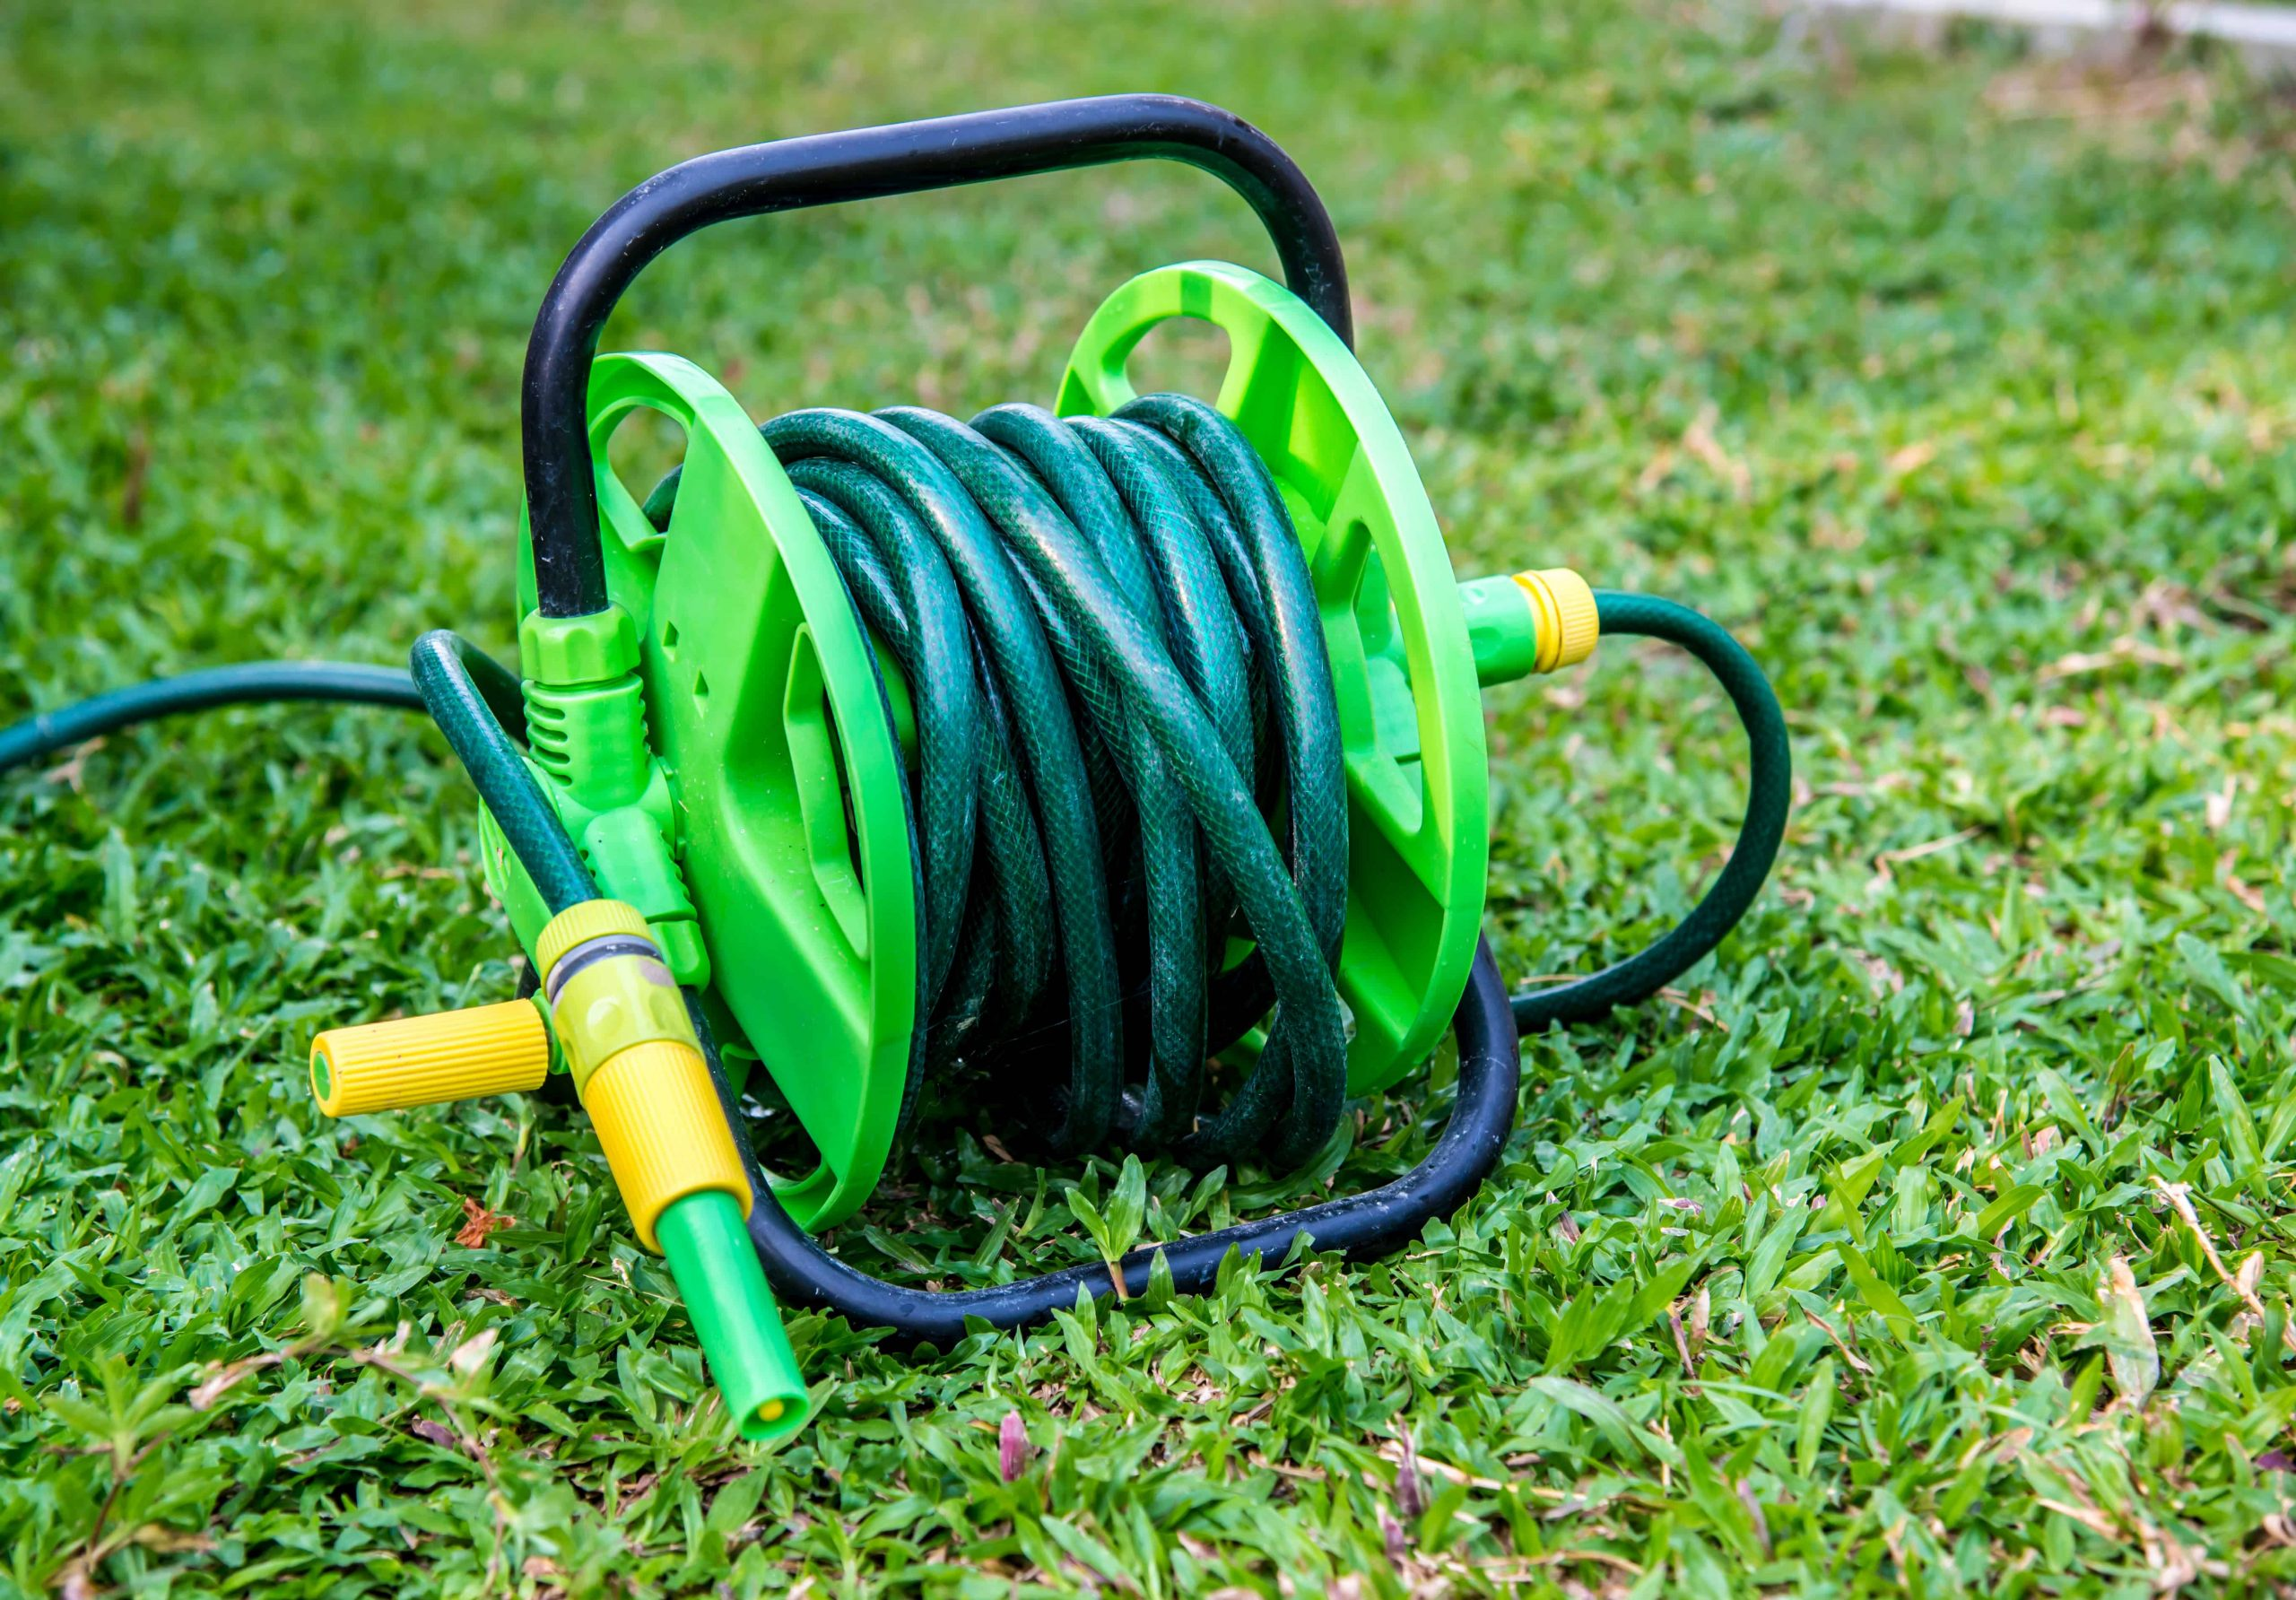 Manguera verde en jardín